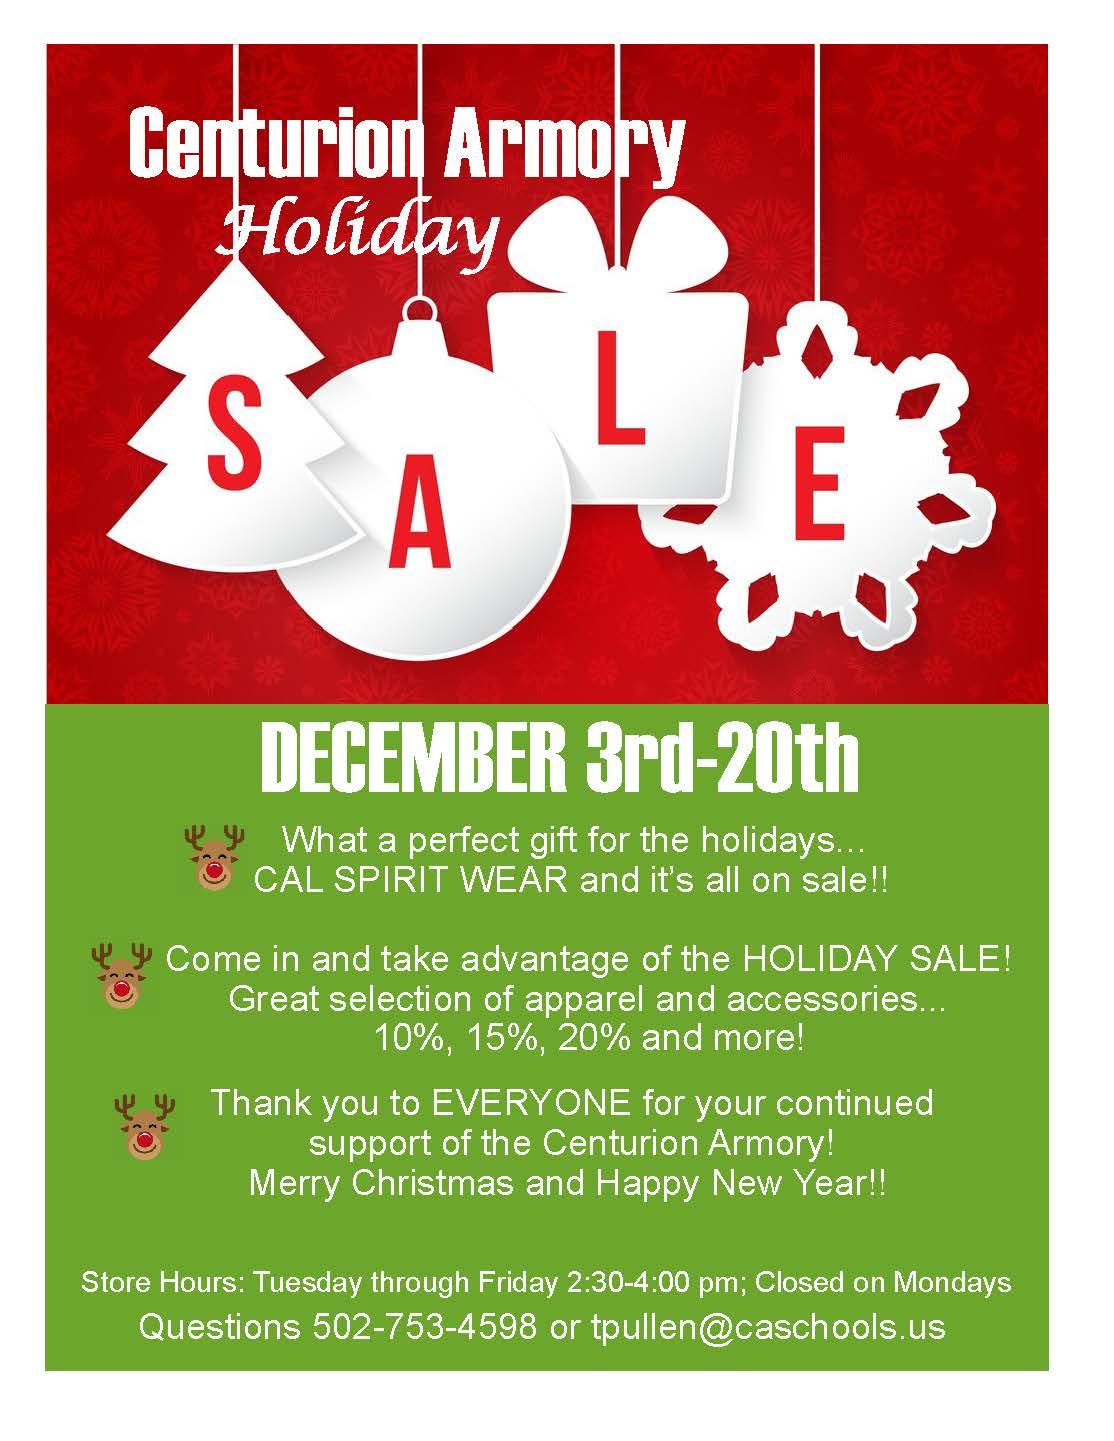 Christian Academy School System | Christian Academy of Louisville | Centurion Armory Holiday Sale | December 3-20